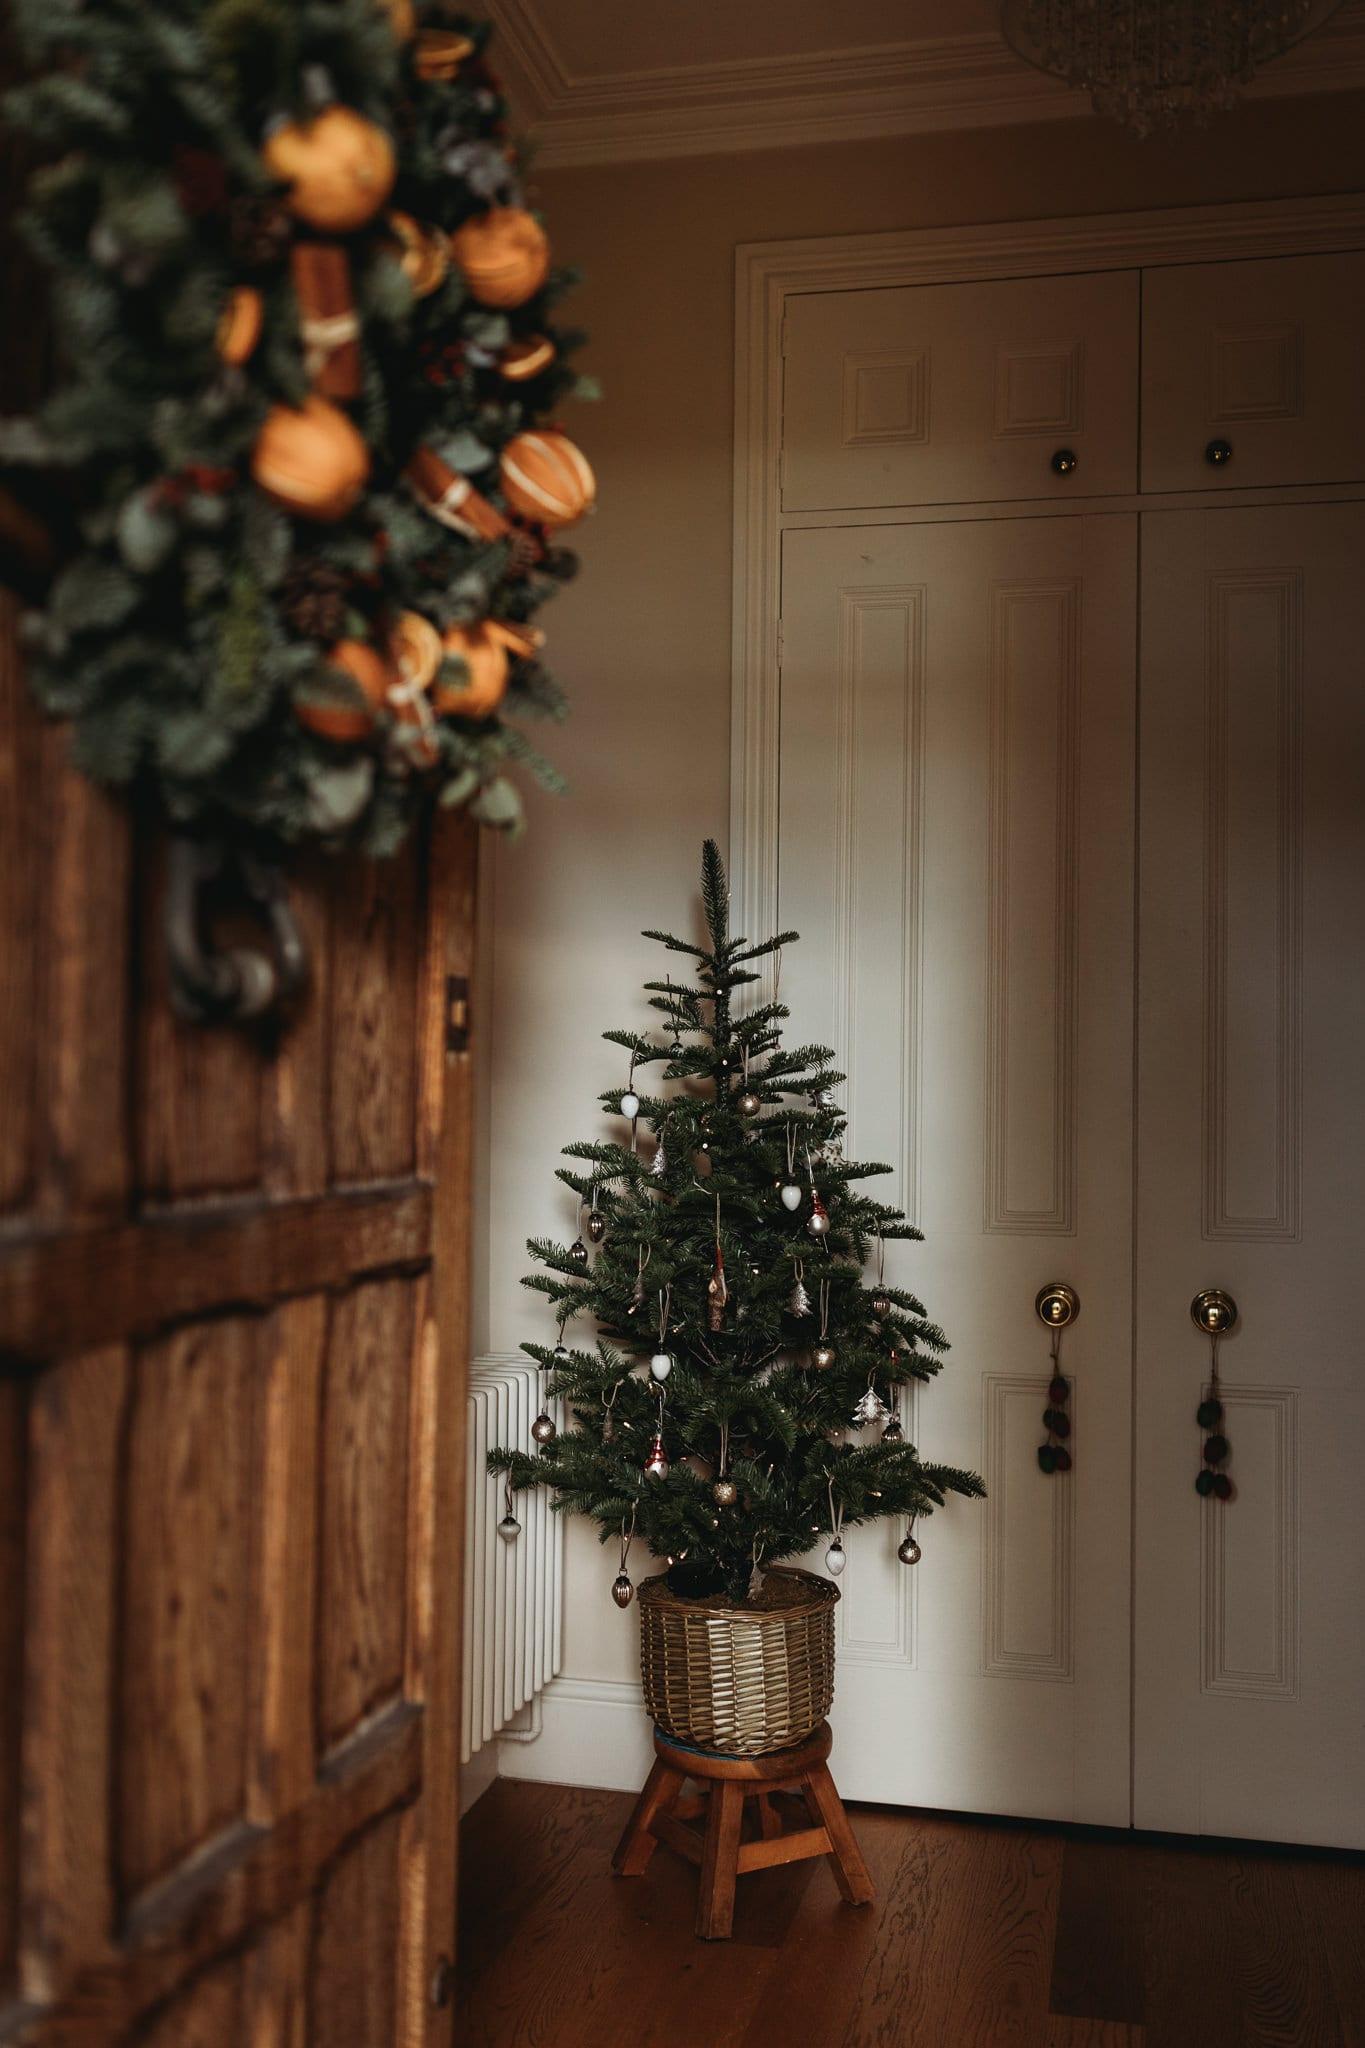 small Christmas tree on a stool, door is open, christmas wreath is hanging on door